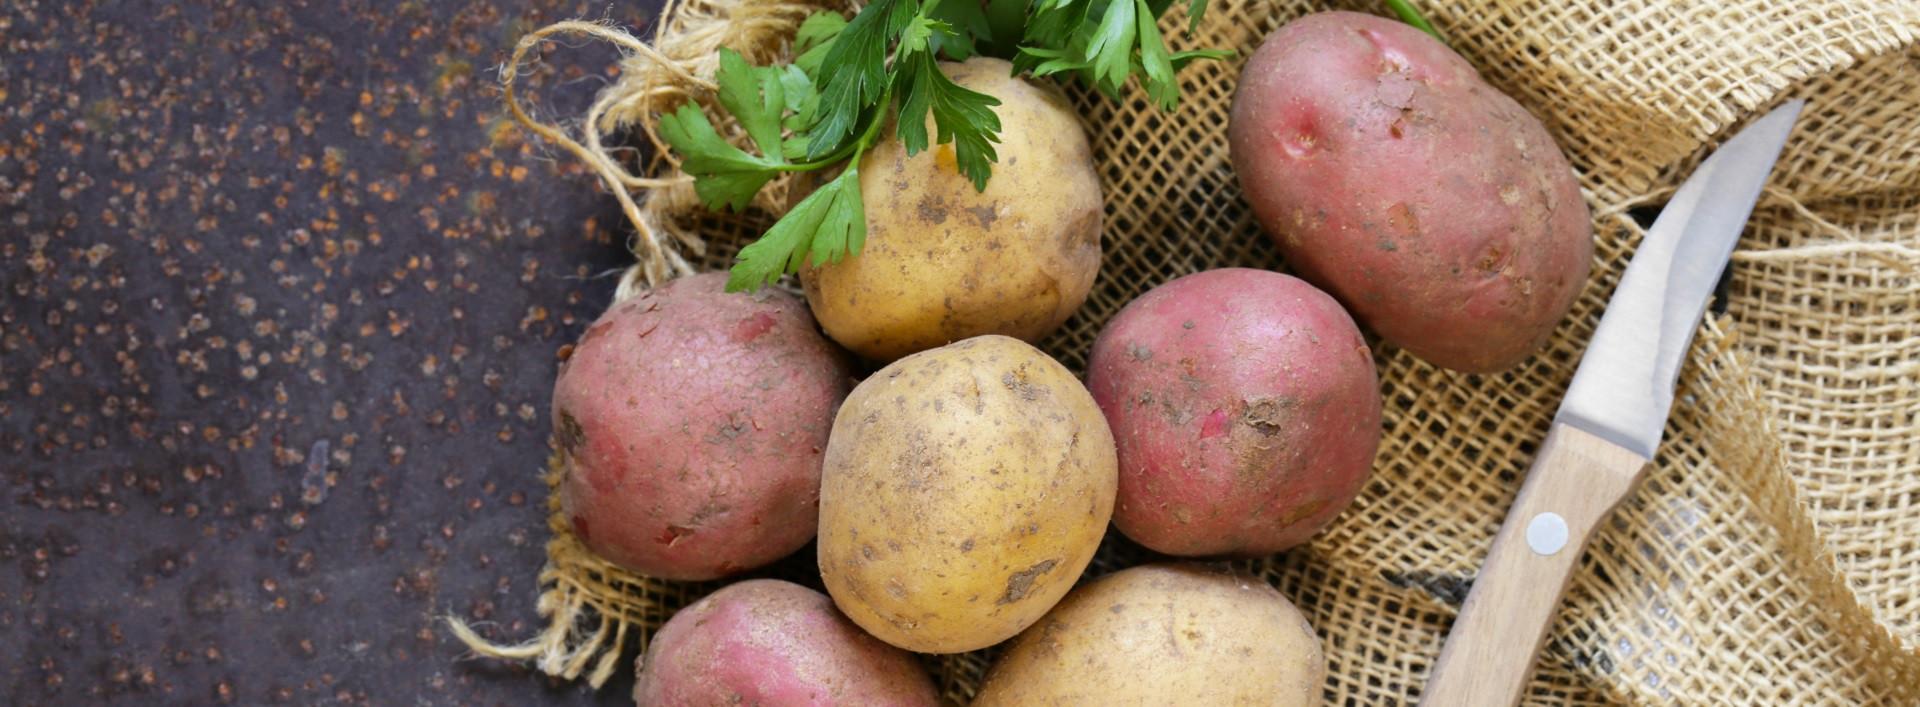 - organic potatoes natureshousegr - Γιατί βιολογικές πατάτες και όχι συμβατικές;